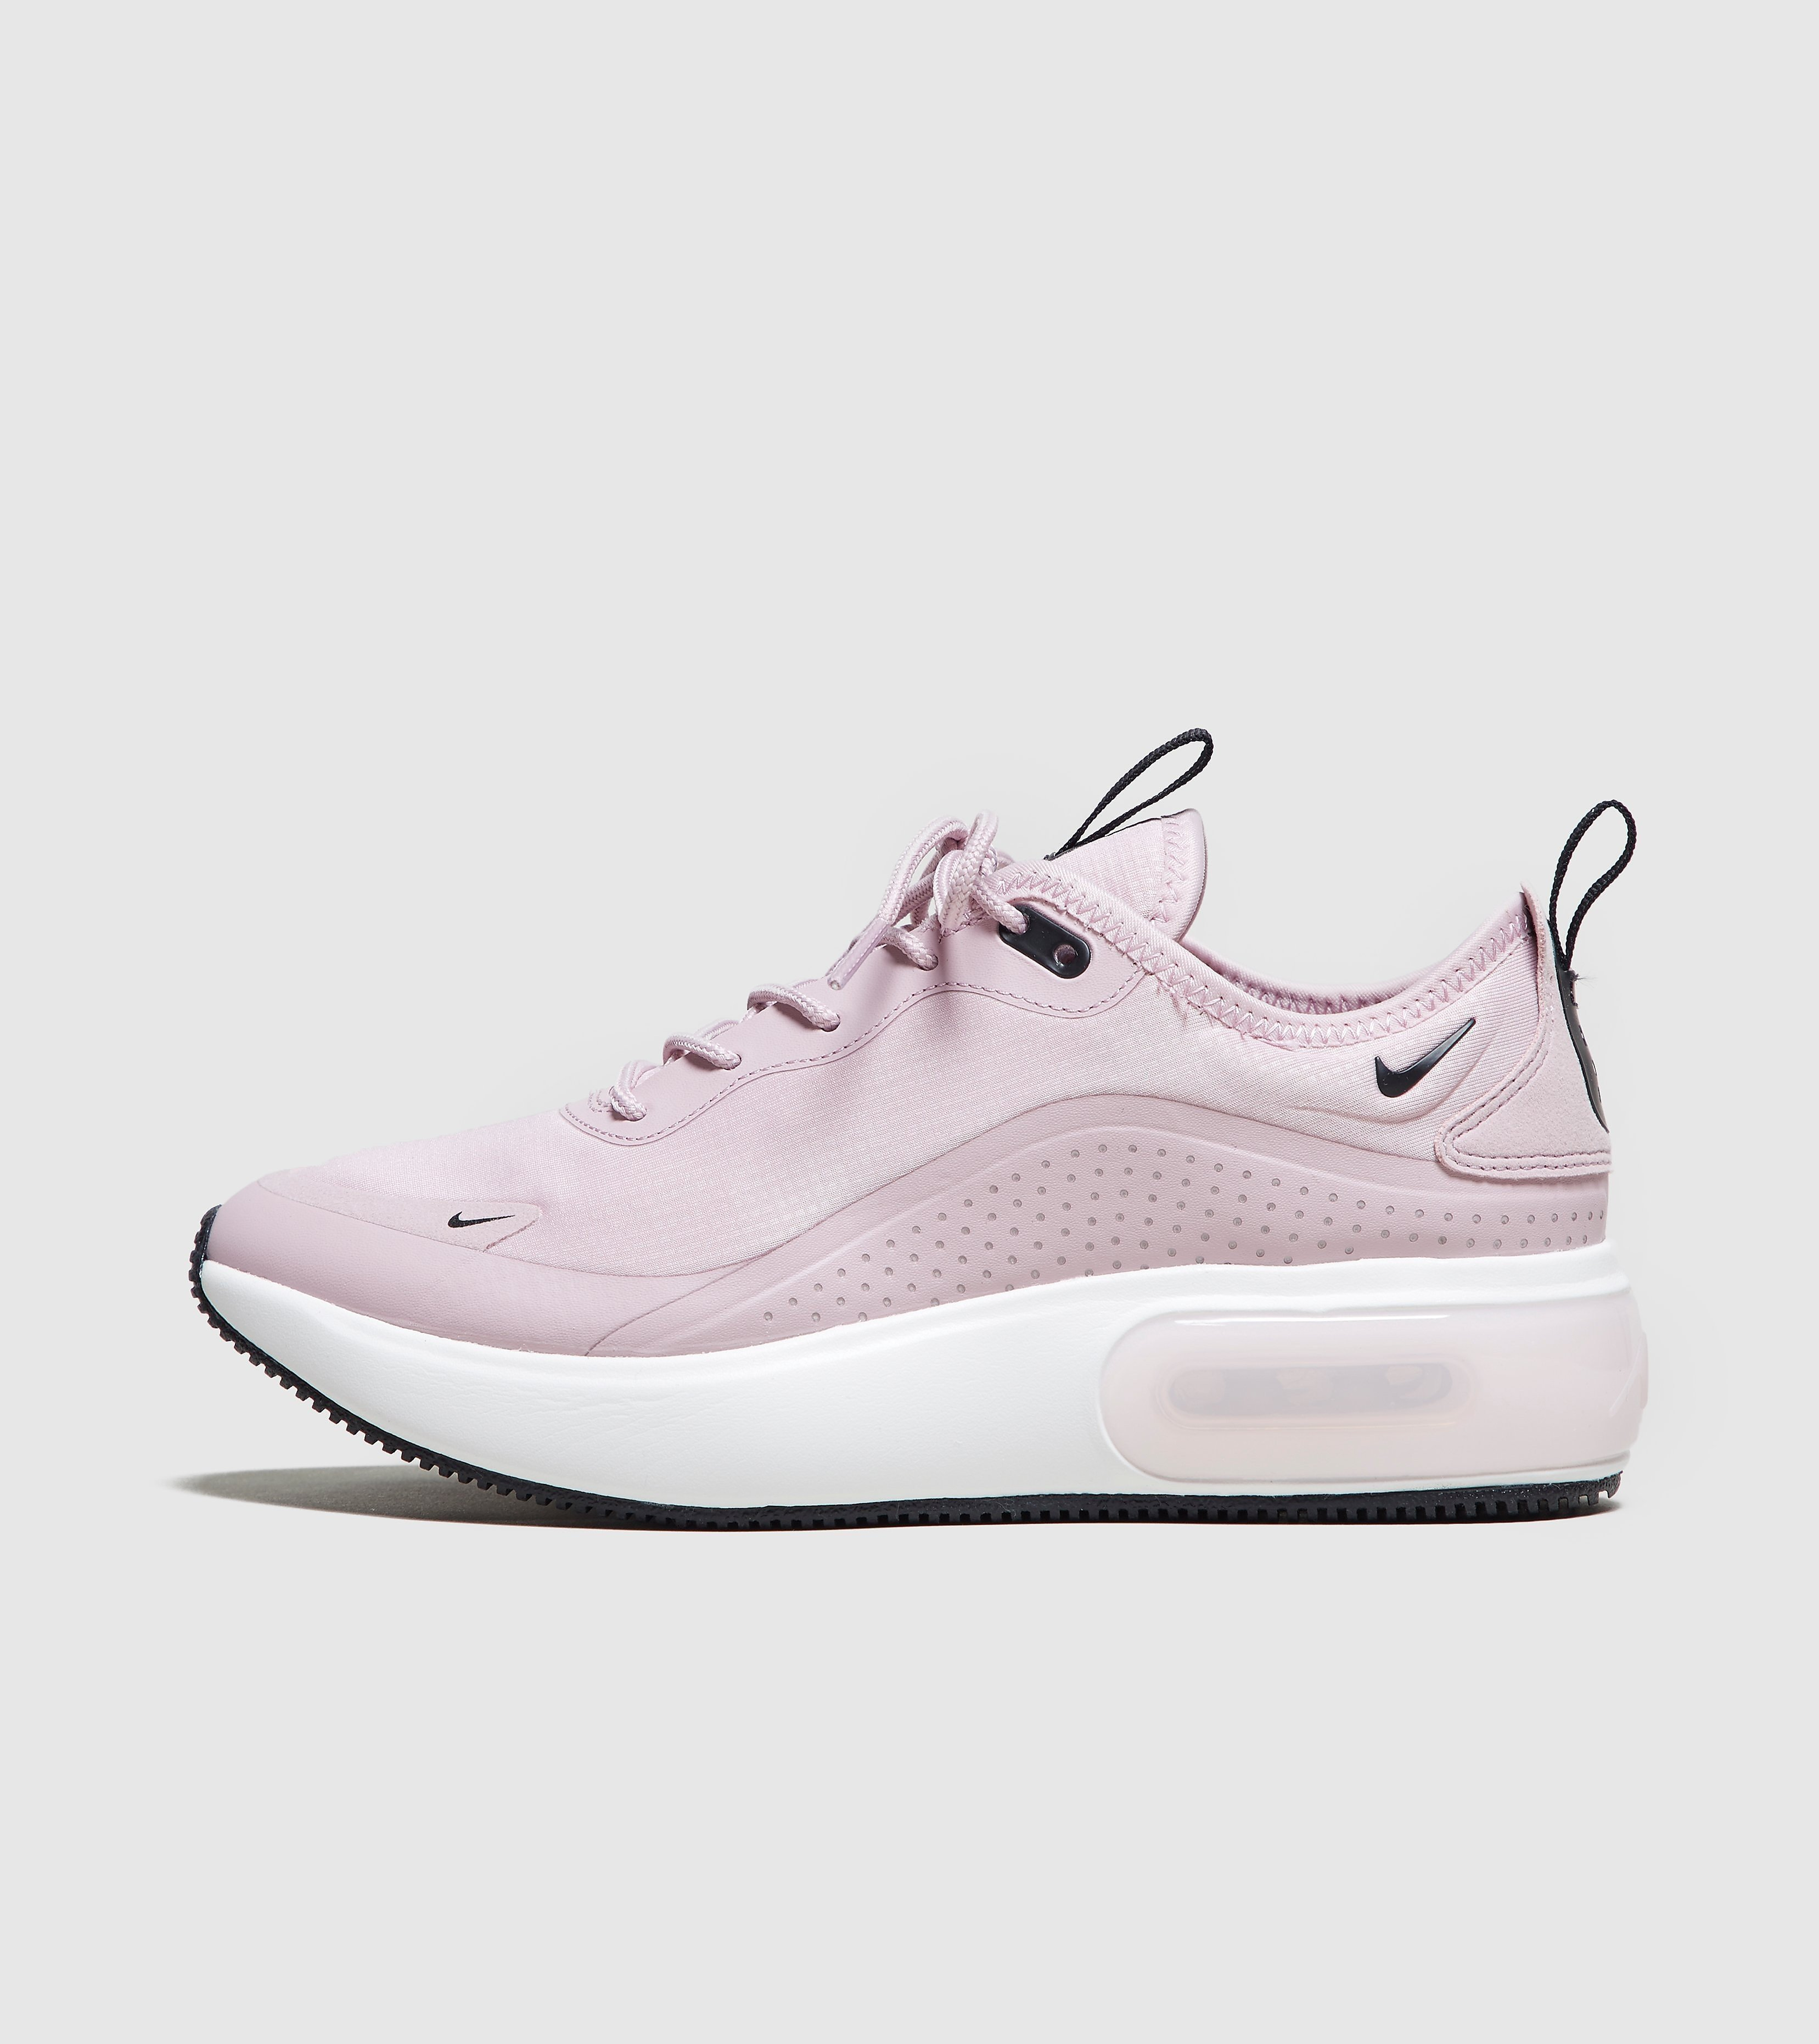 nike air max dames roze